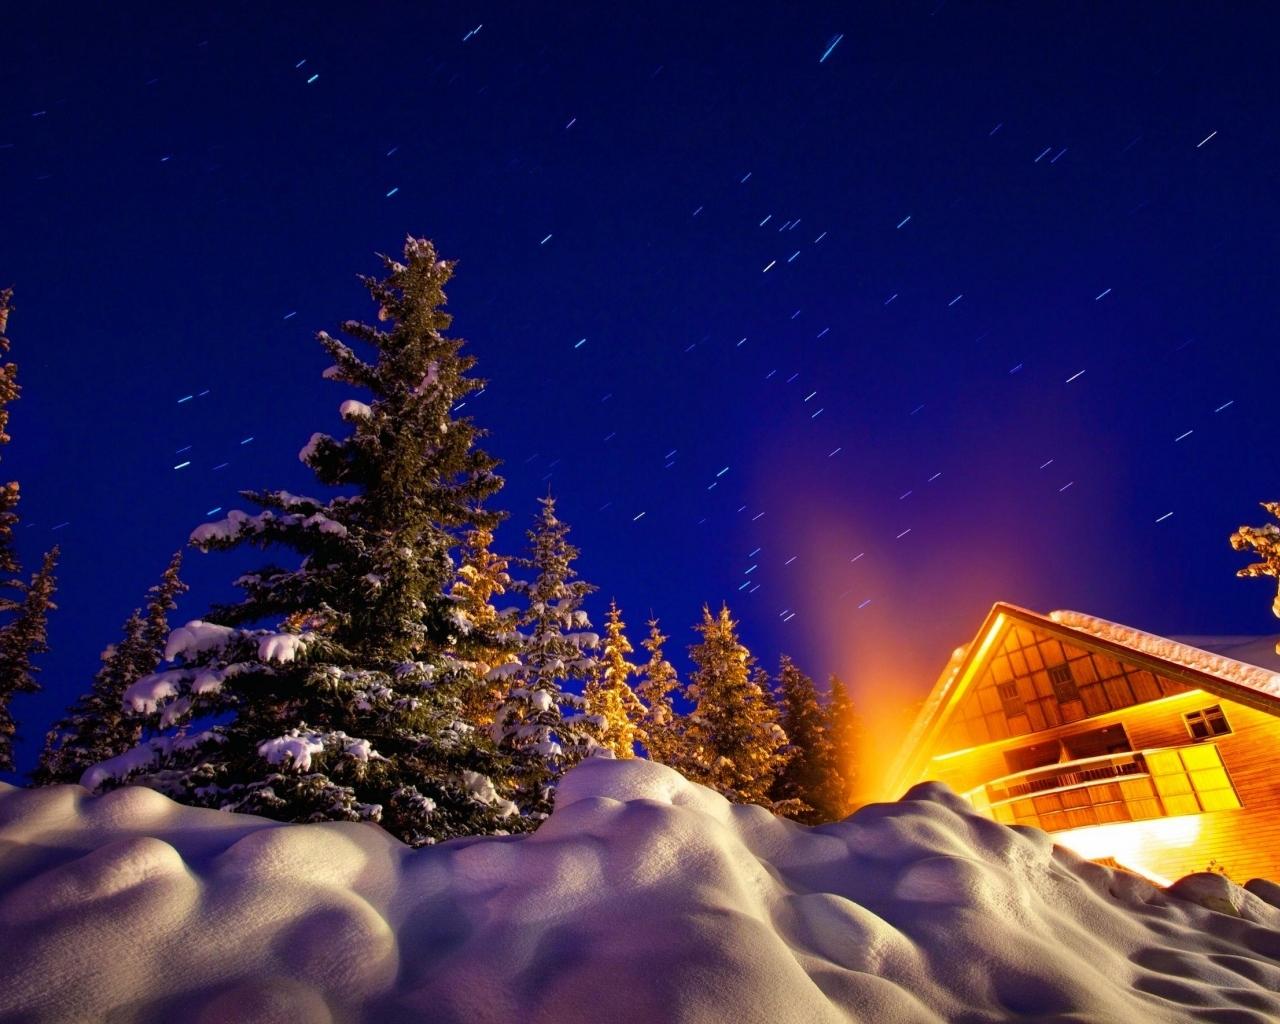 hd winter night wallpaper MEMES 1280x1024